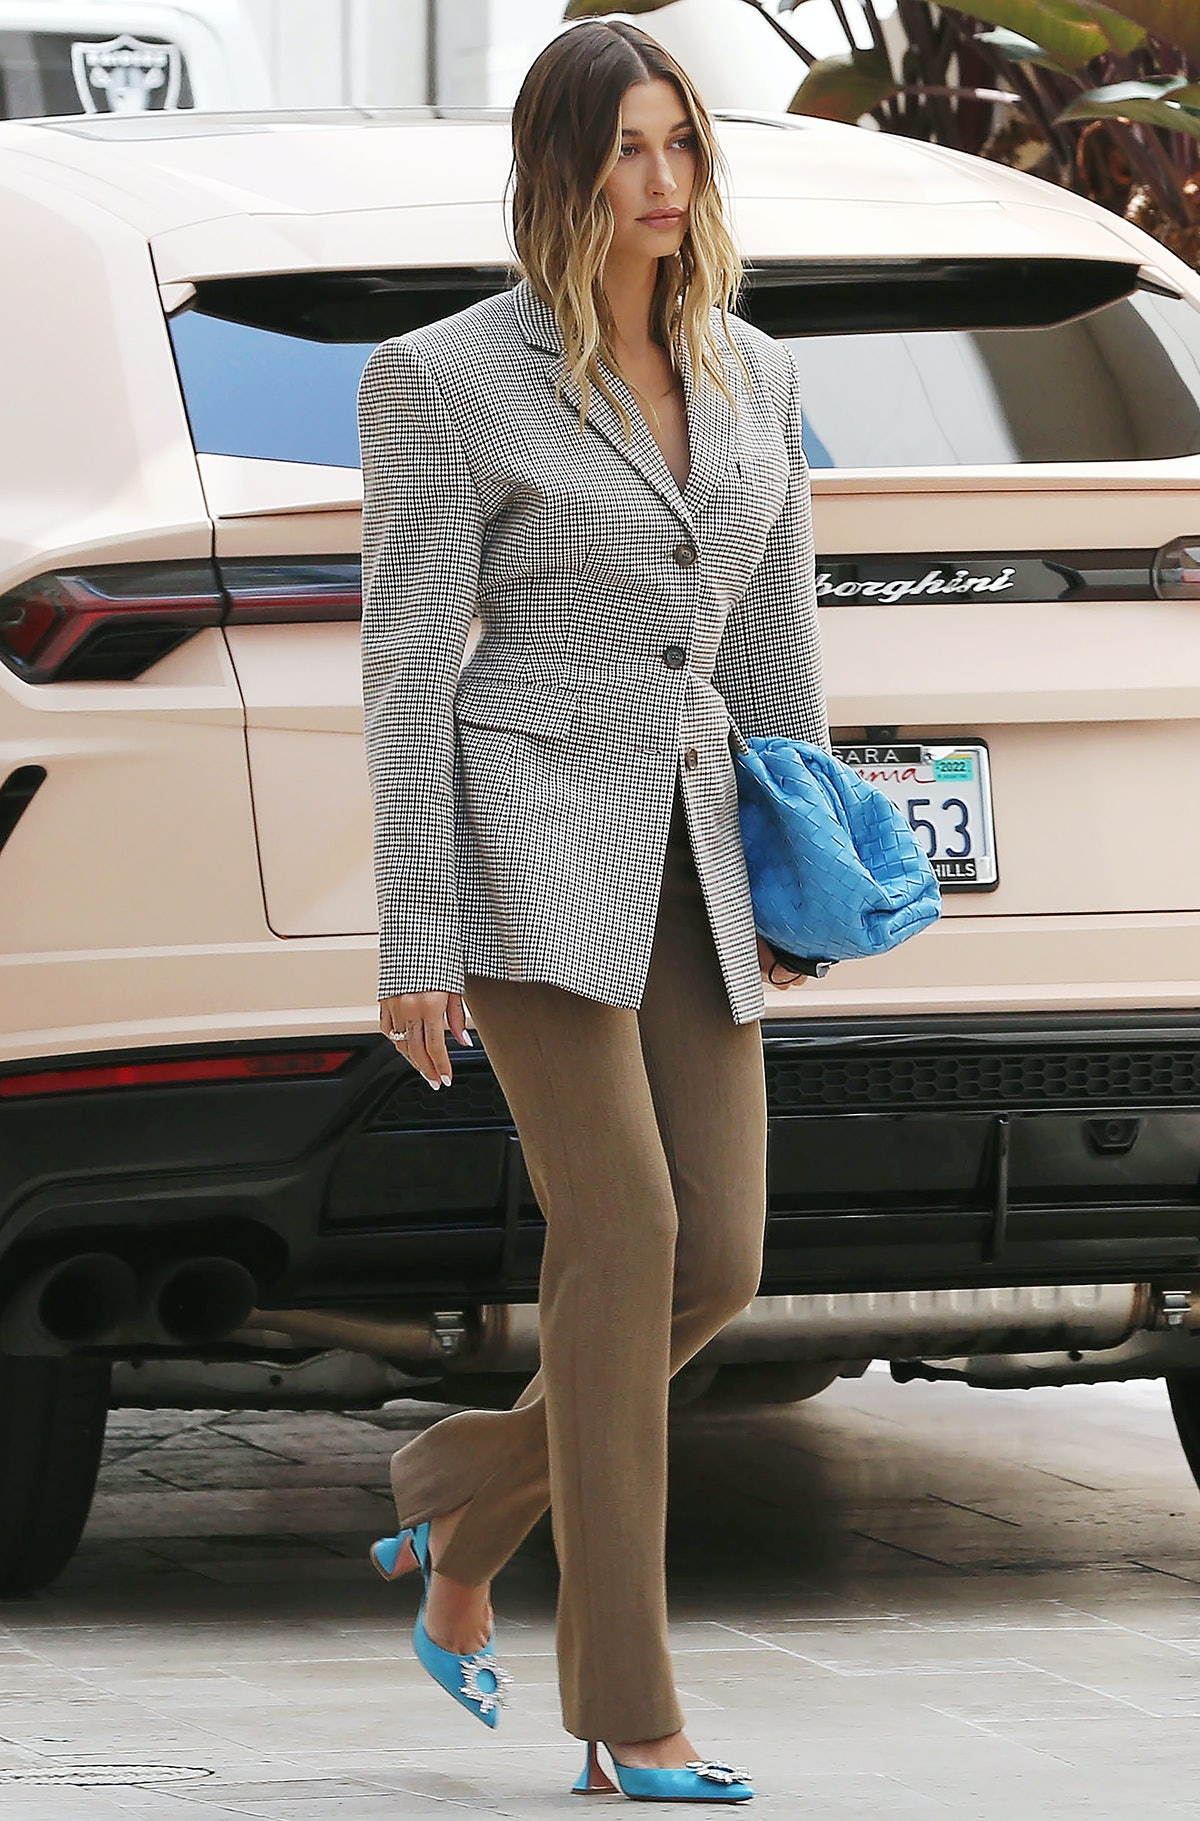 Hailey Bieber is seen in Los Angeles, California in April 2021.